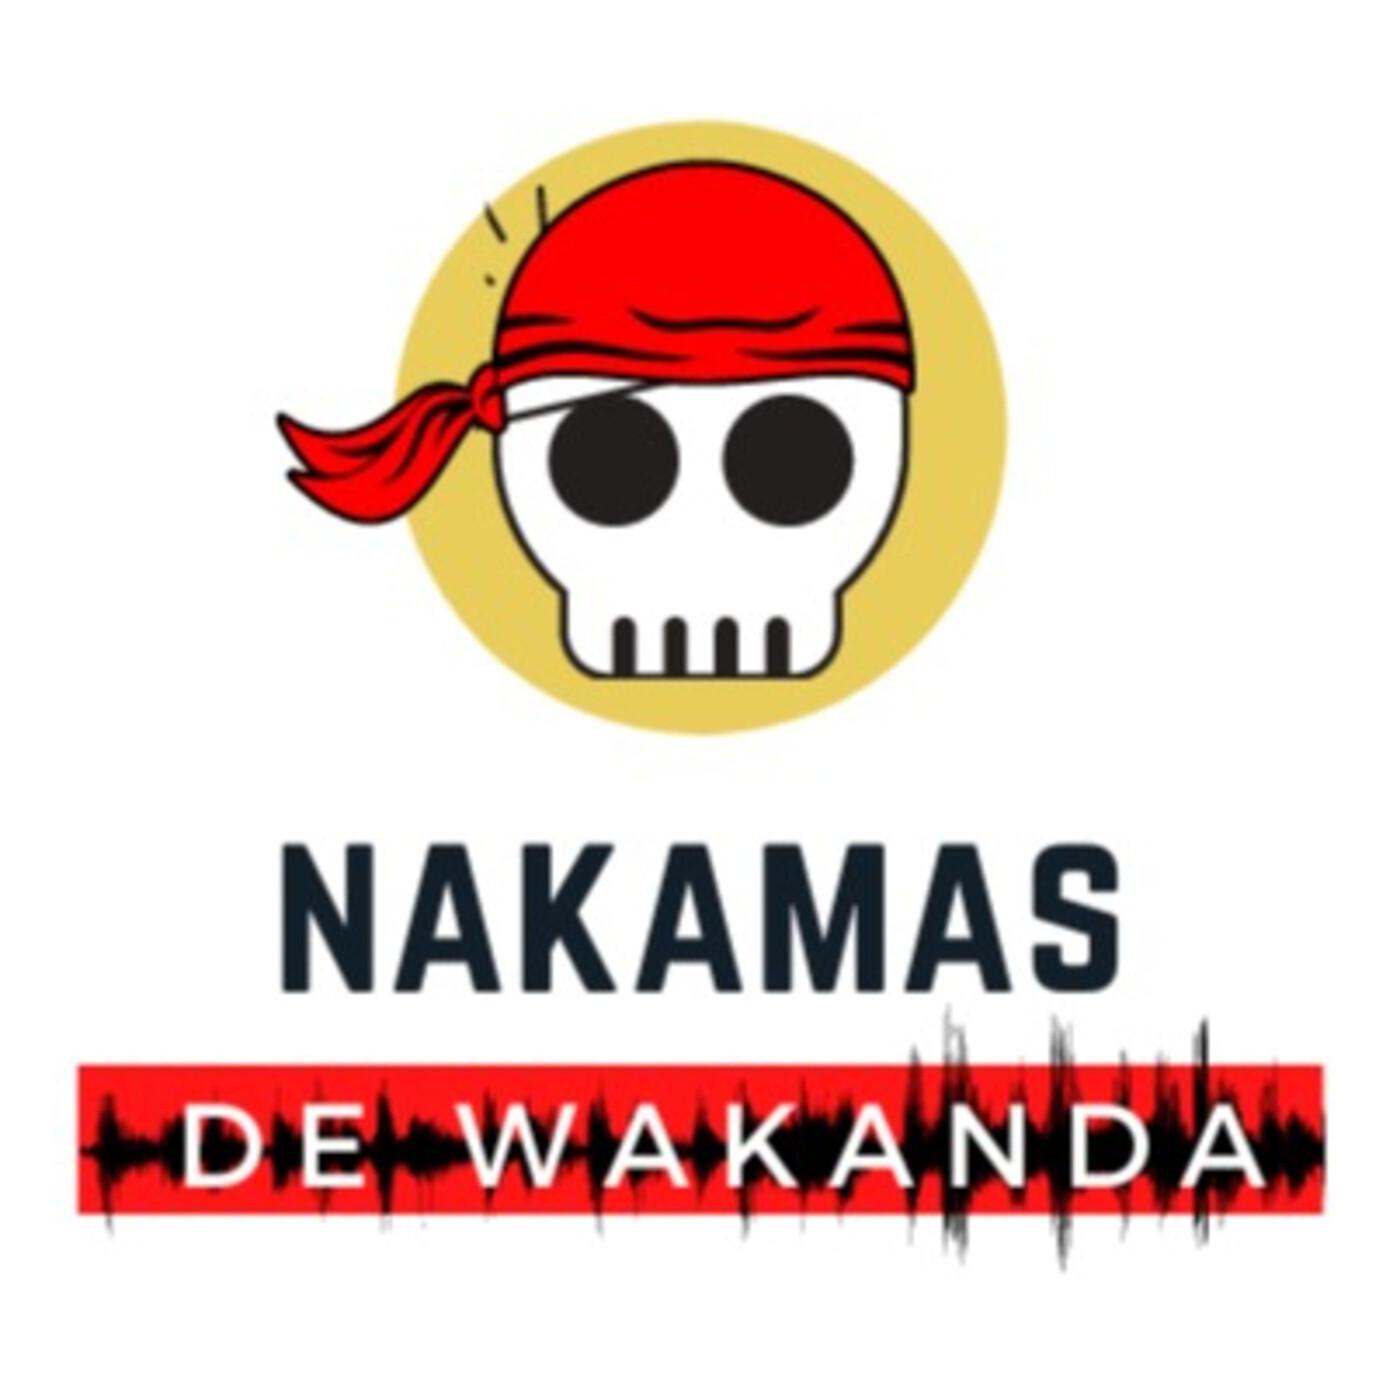 Nakamas de Wakanda